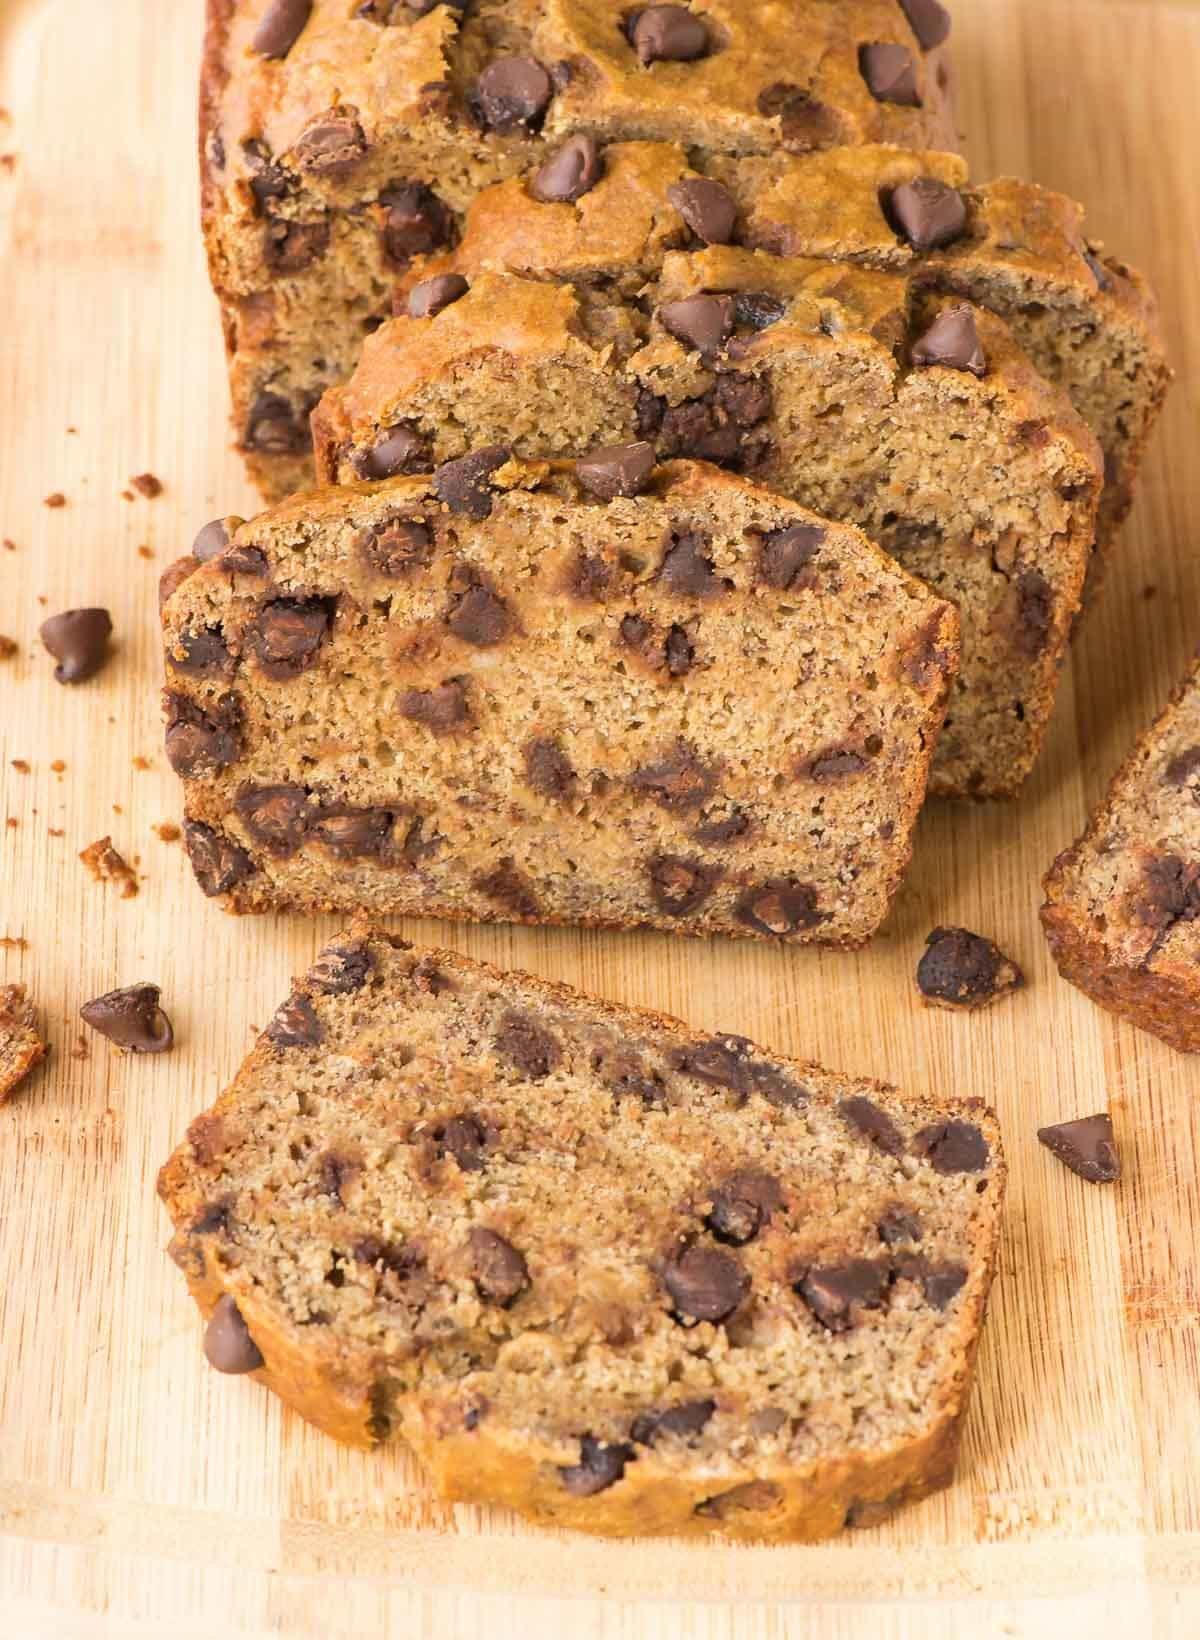 Best Healthy Banana Bread Recipe  Healthy Banana Bread Recipe with Chocolate Chips